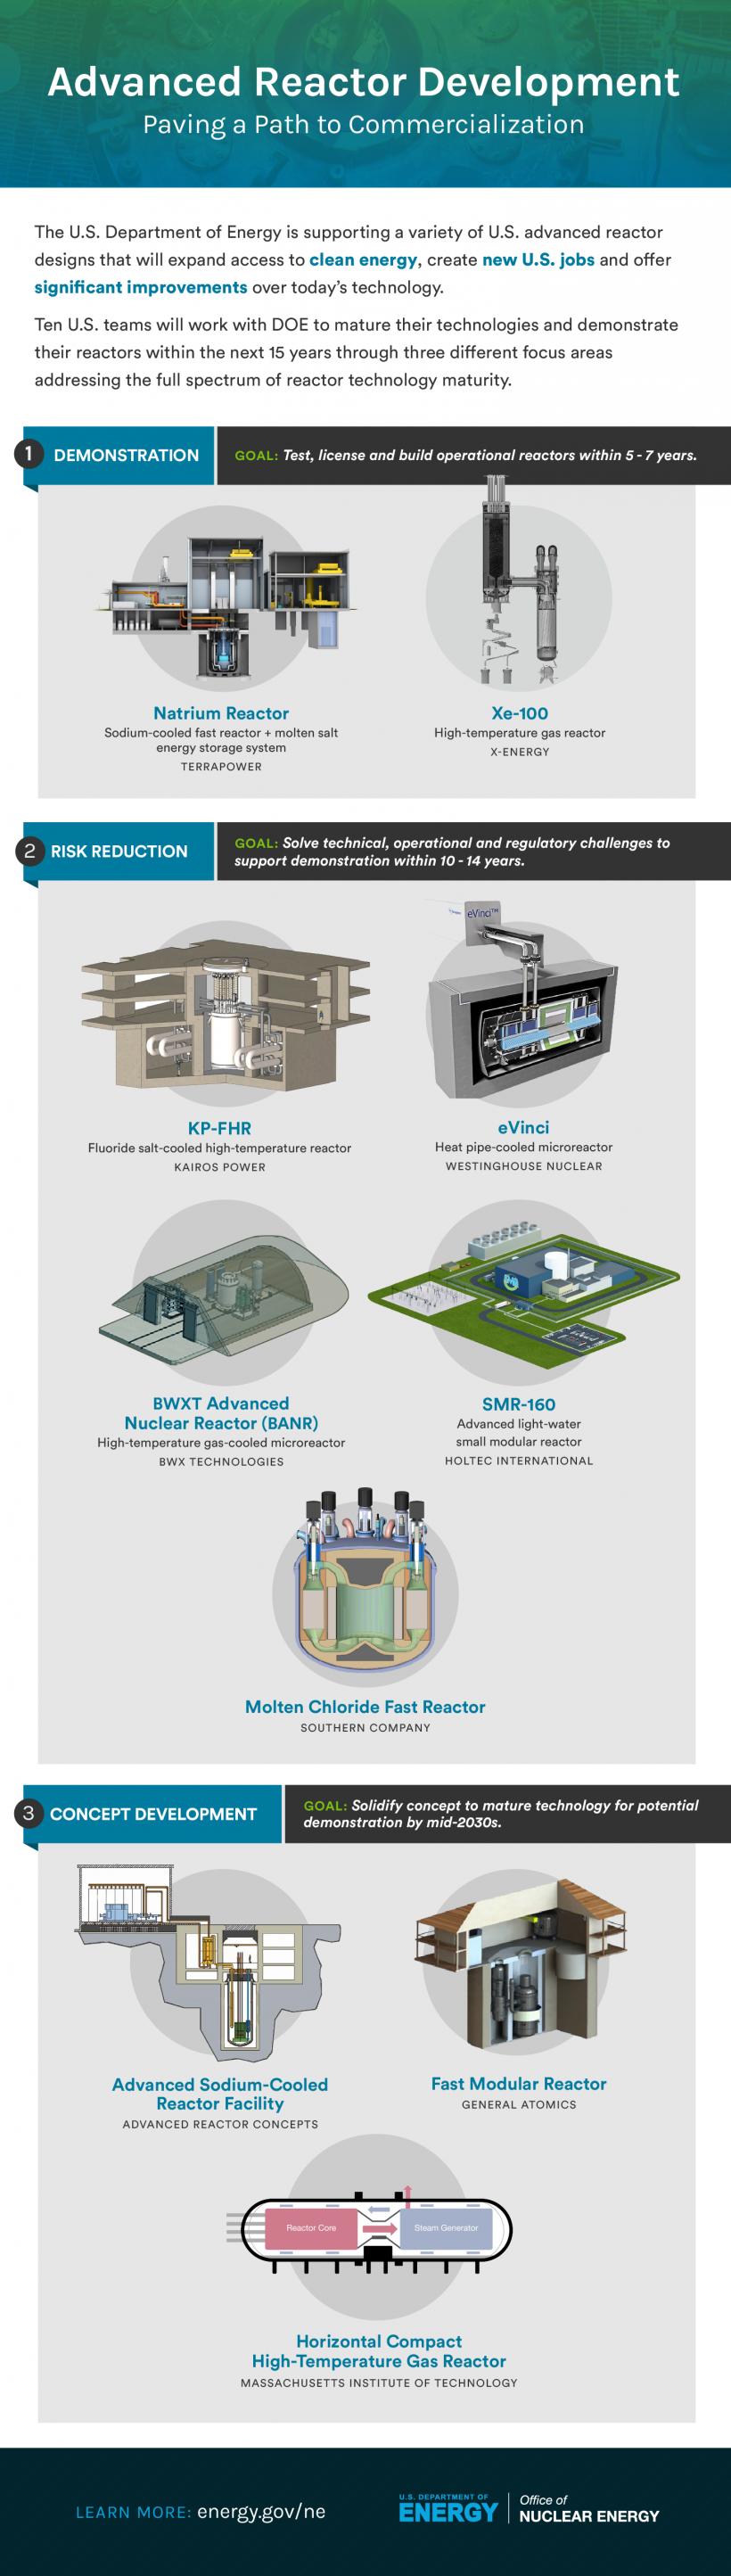 Advanced Reactor Development